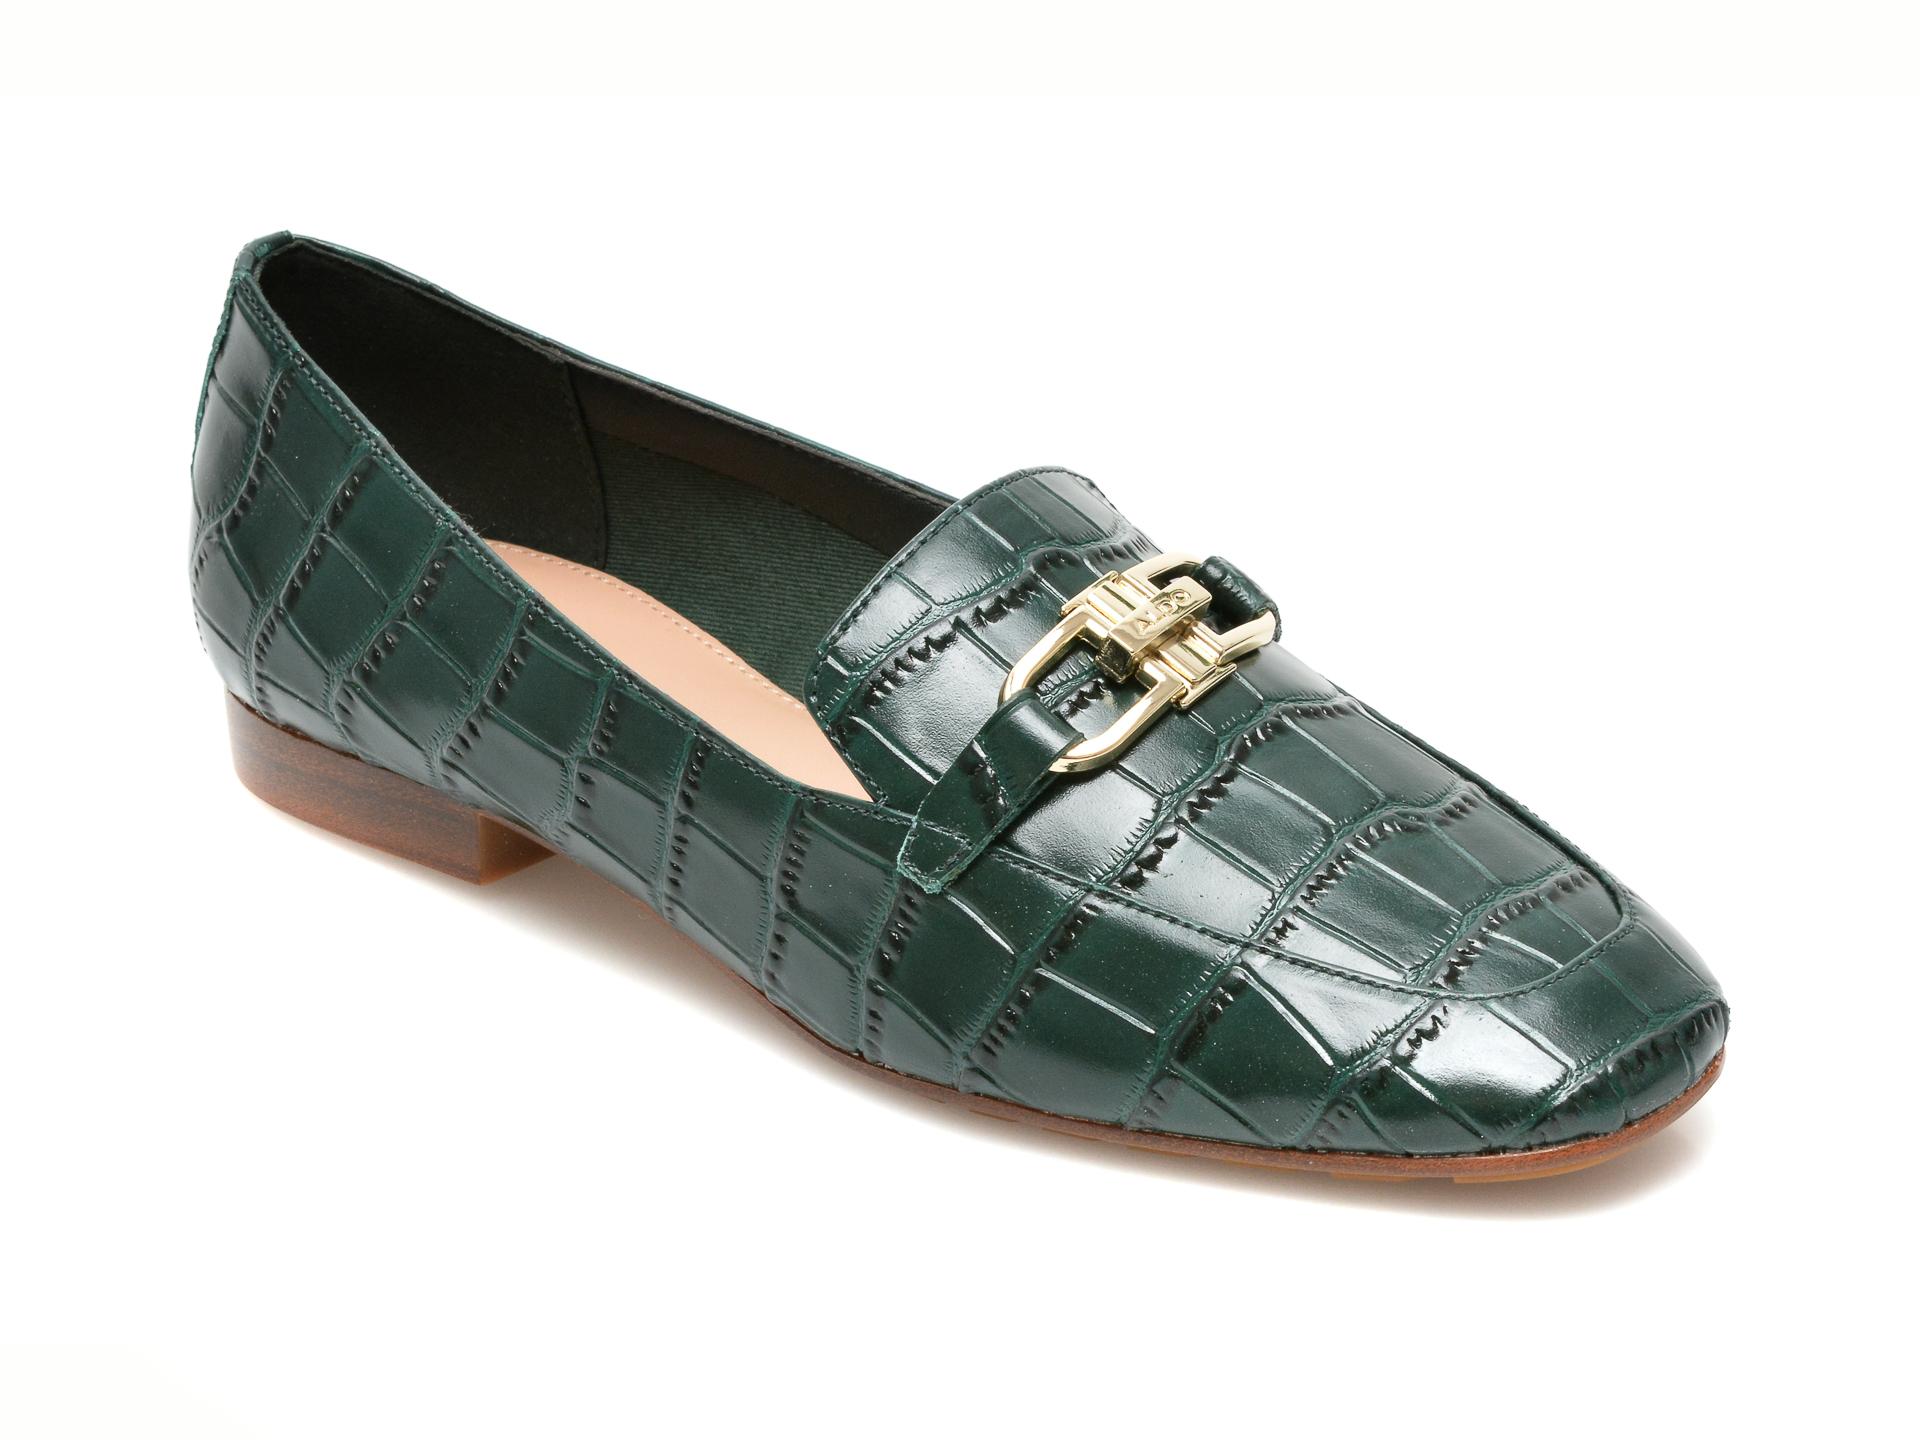 Pantofi Aldo Verzi, Gwutha301, Din Piele Croco